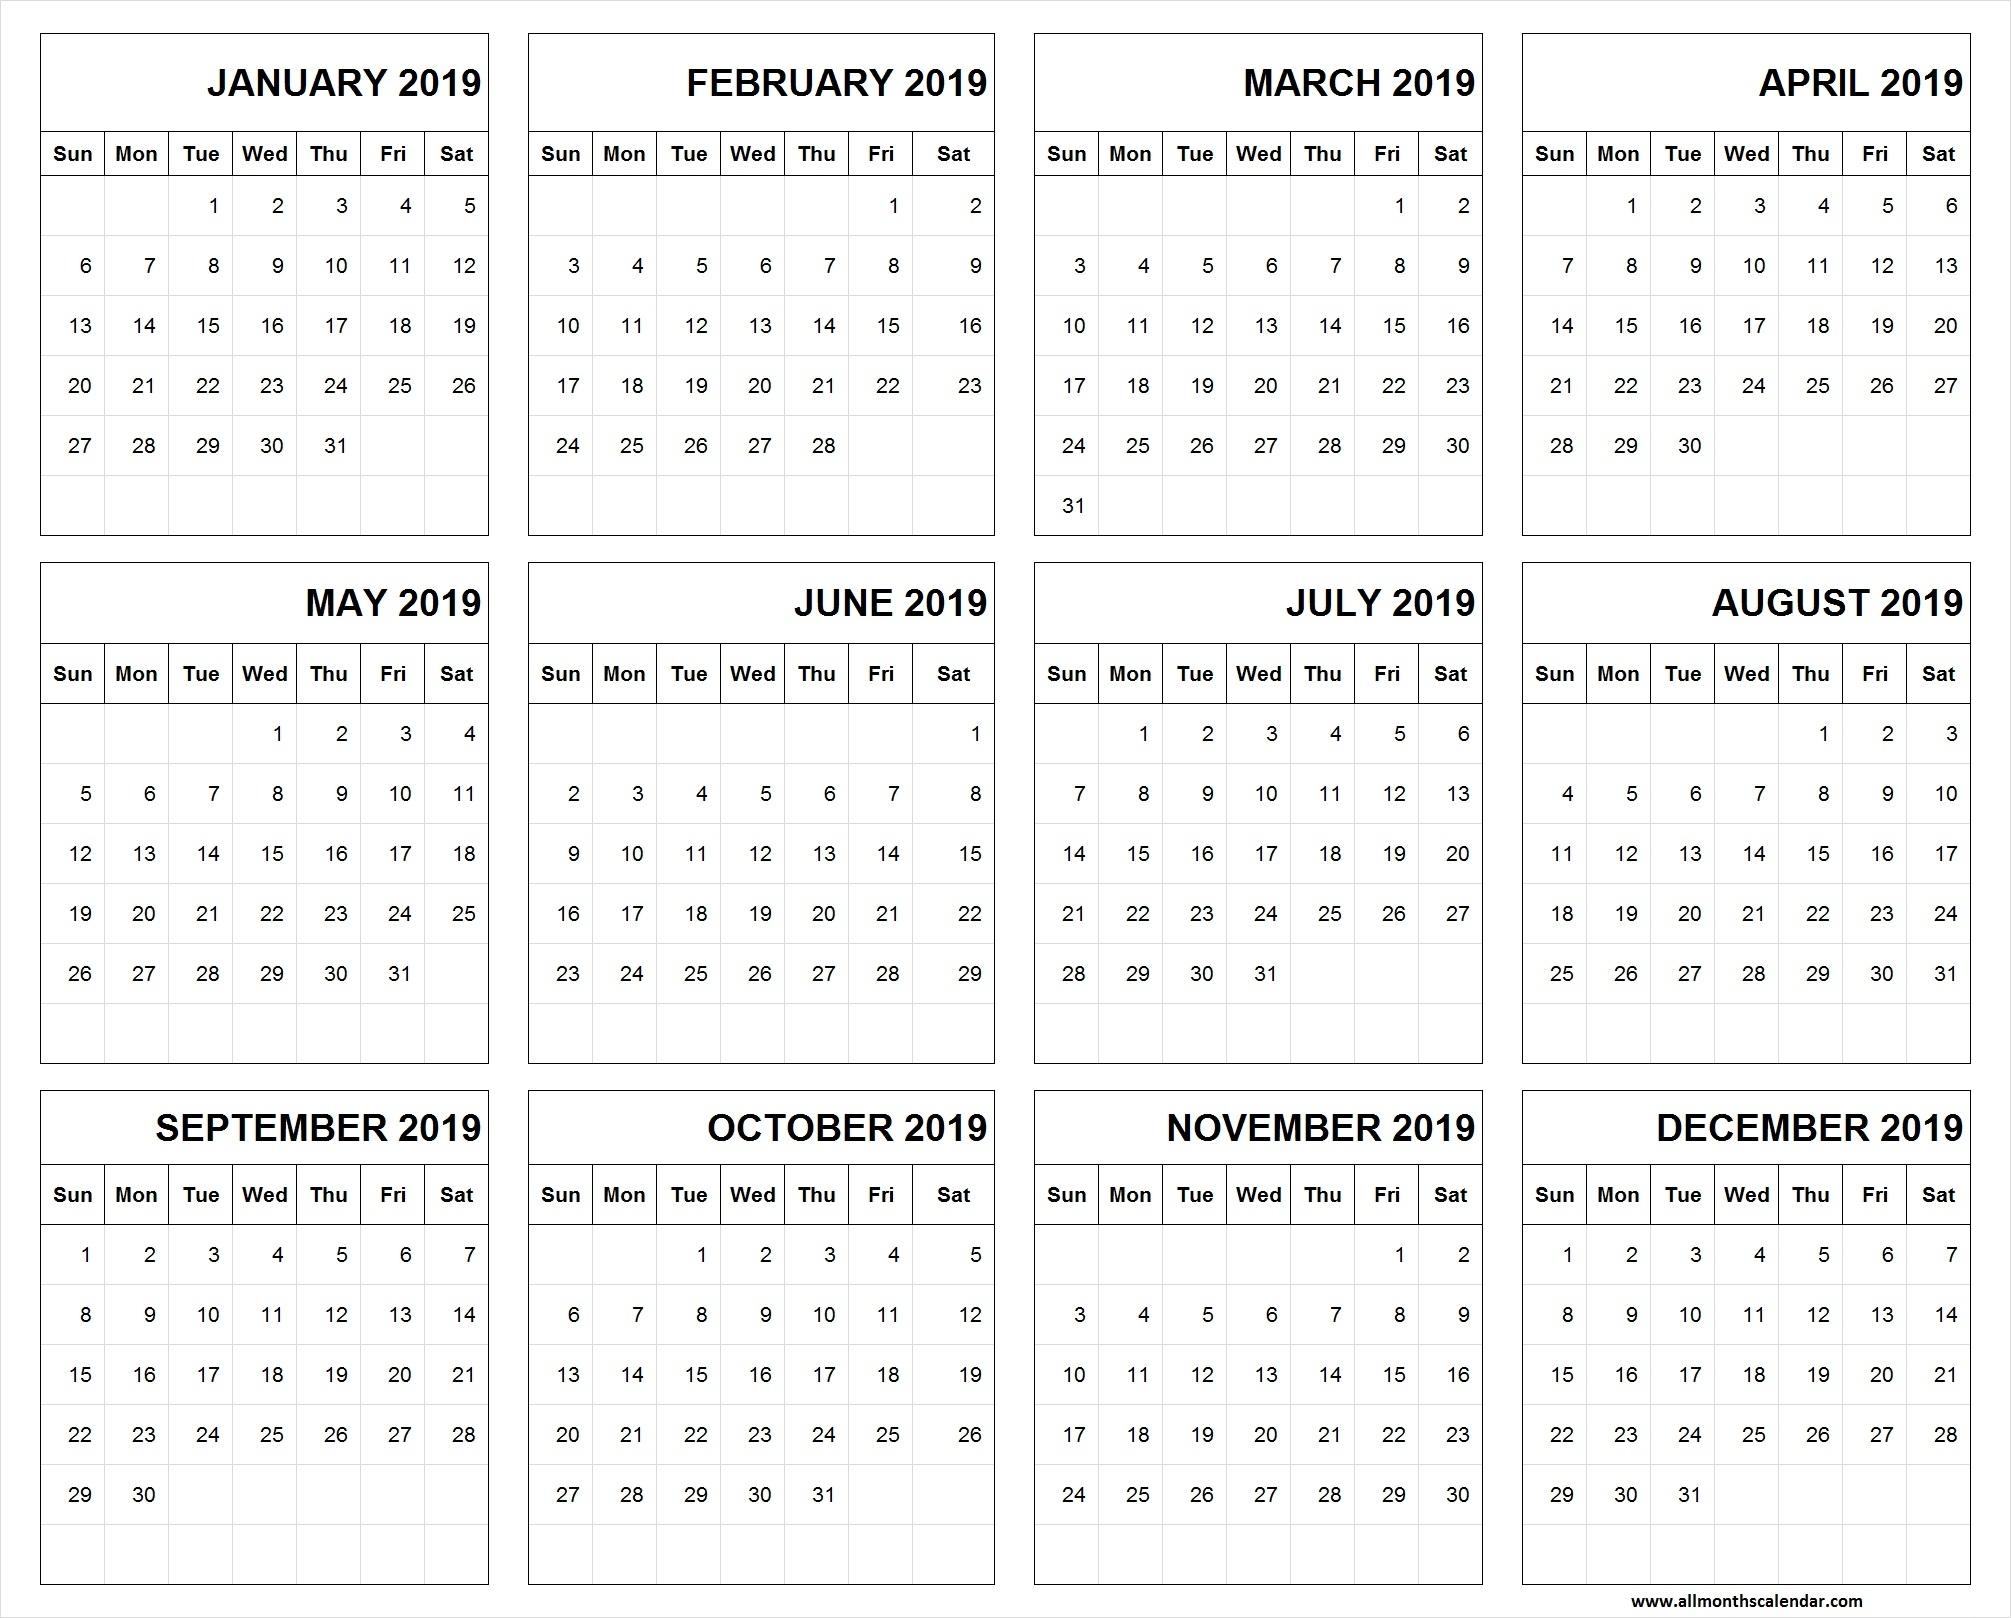 Printable Calendar January 2019 To December 2019 Template | 12 Months pertaining to Images Of A Calendar January Through December